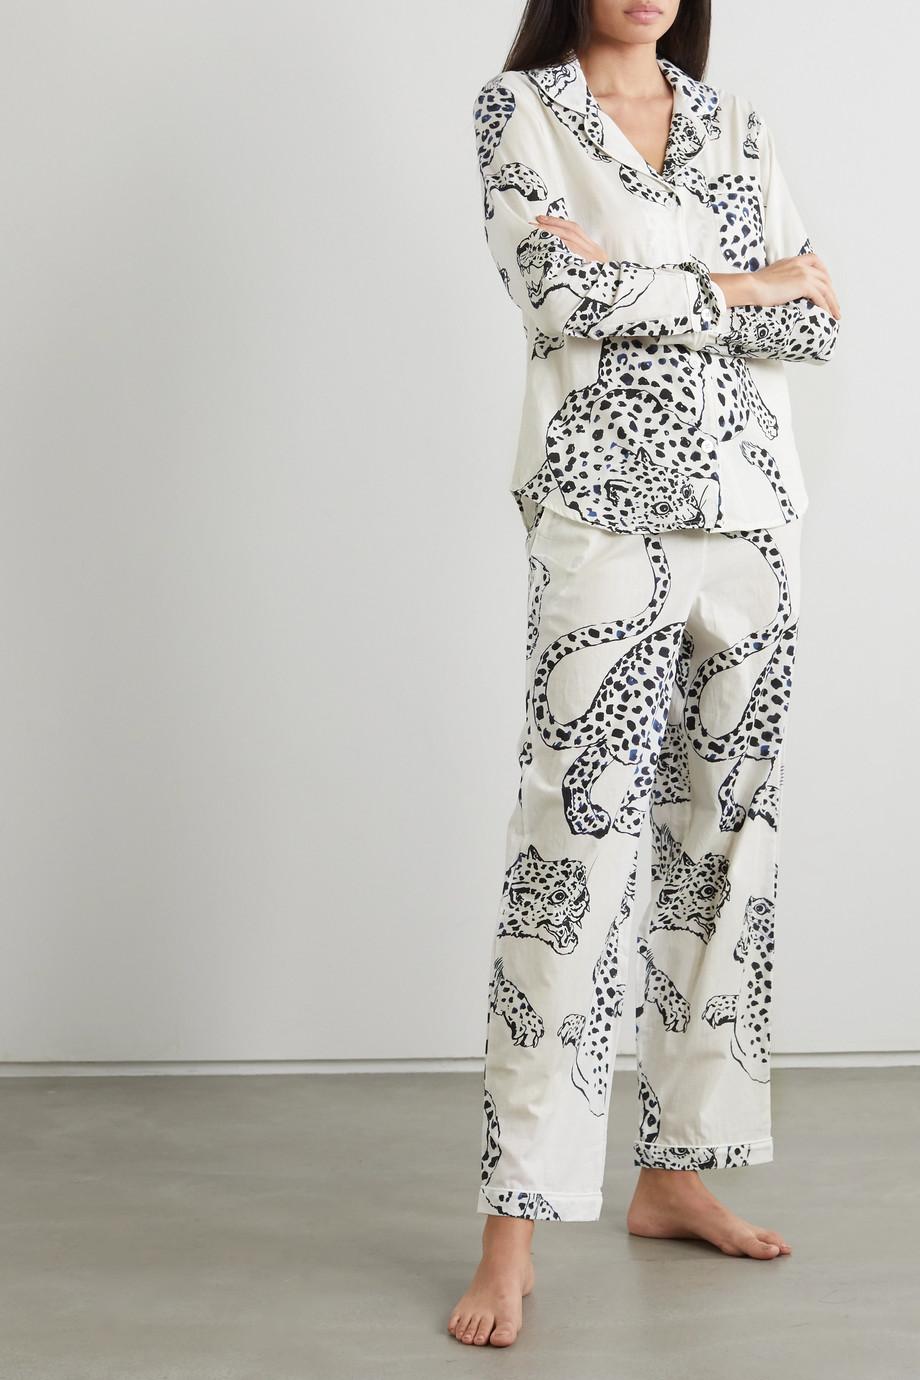 Desmond & Dempsey Jag printed organic cotton pajama set